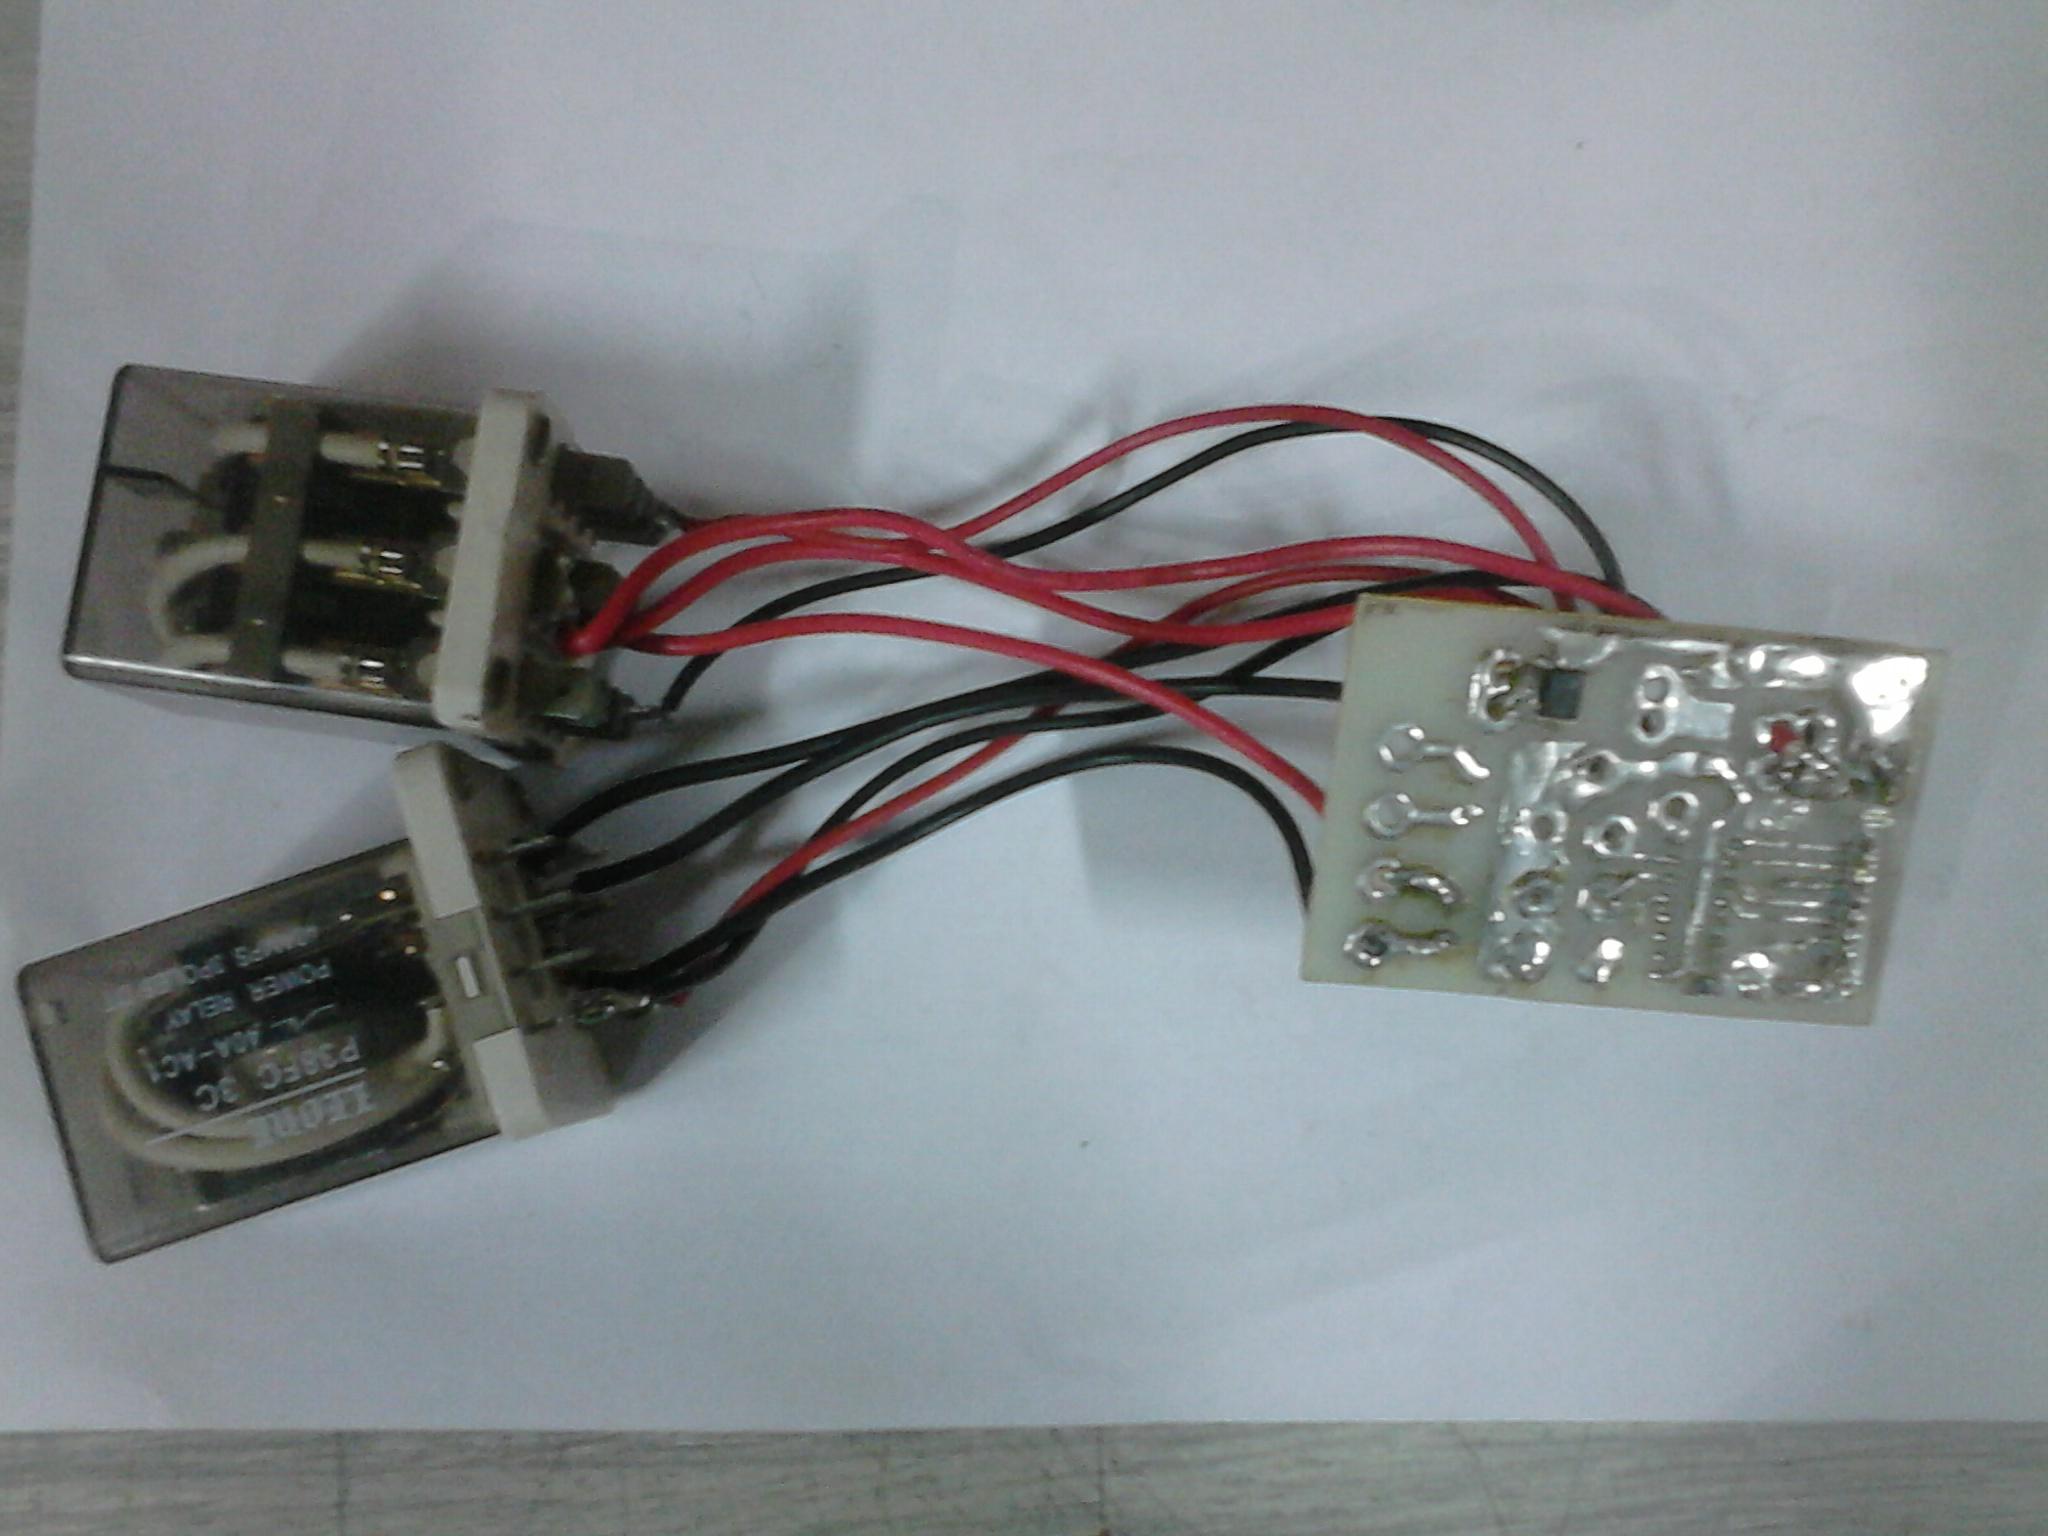 Load testing setup: tiny relay-MOSFET motor driver